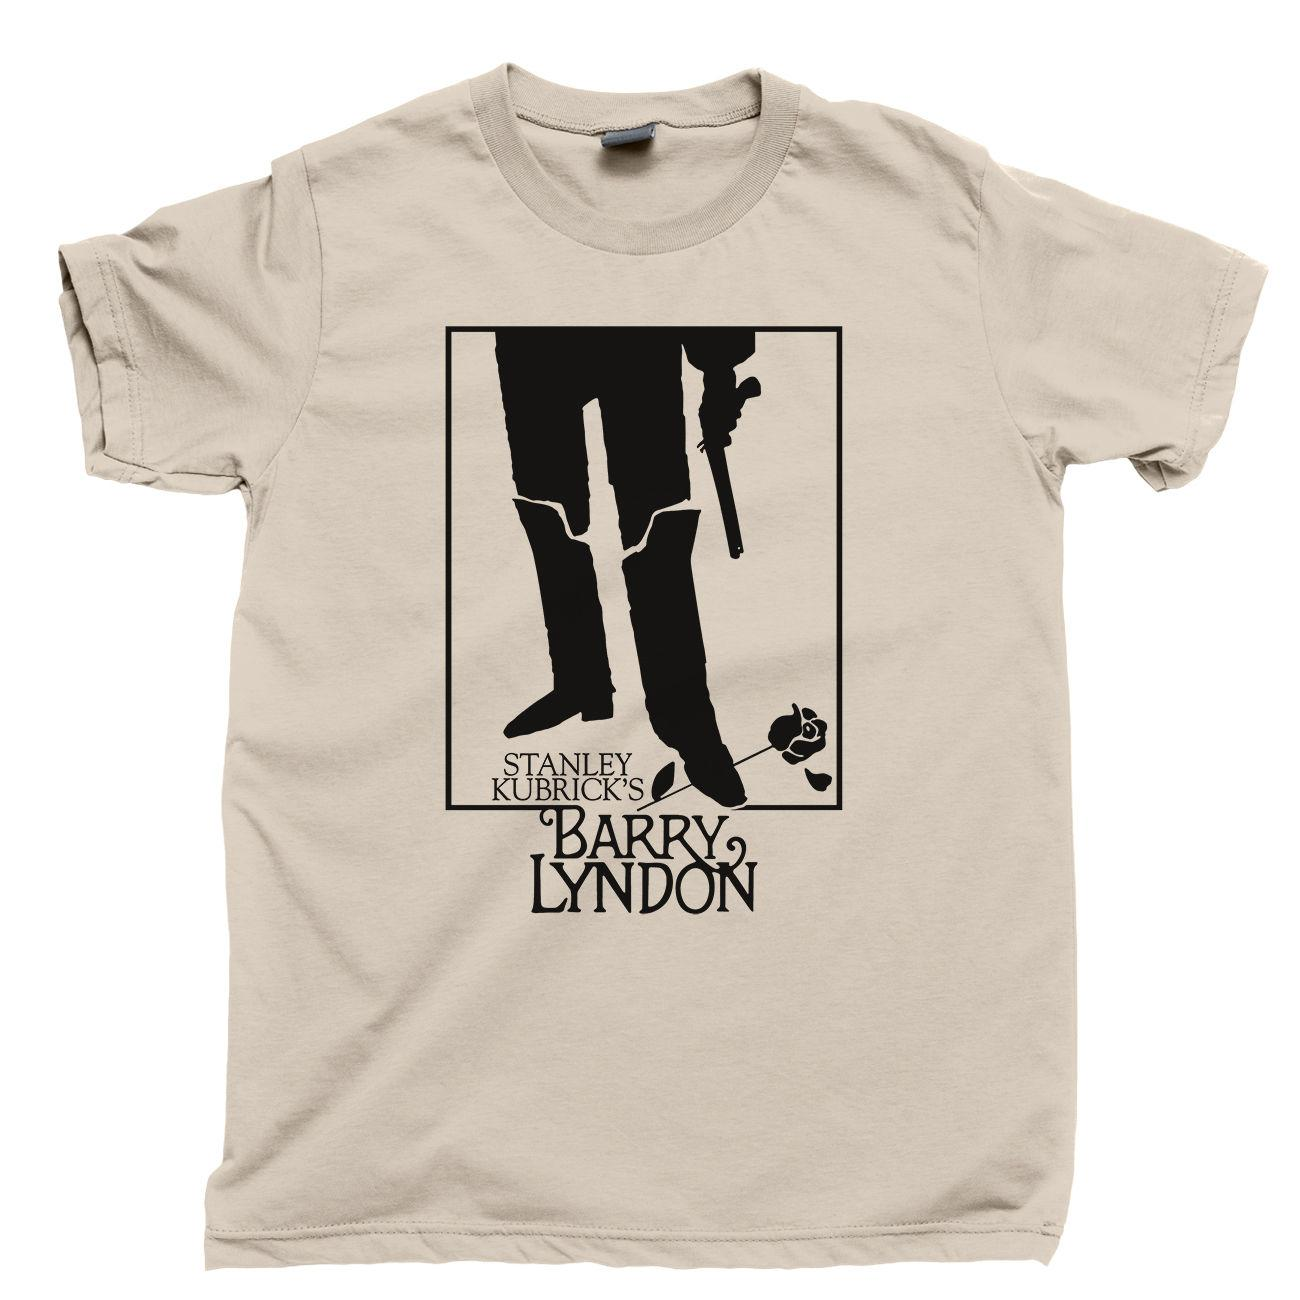 ed7de388e Compre STANLEY KUBRICK Camiseta Barry Lyndon Granadiers Marisa Berenson  Filme Tee Cartaz Engraçado Frete Grátis Unisex Casual Tshirt De  Funnybonetees